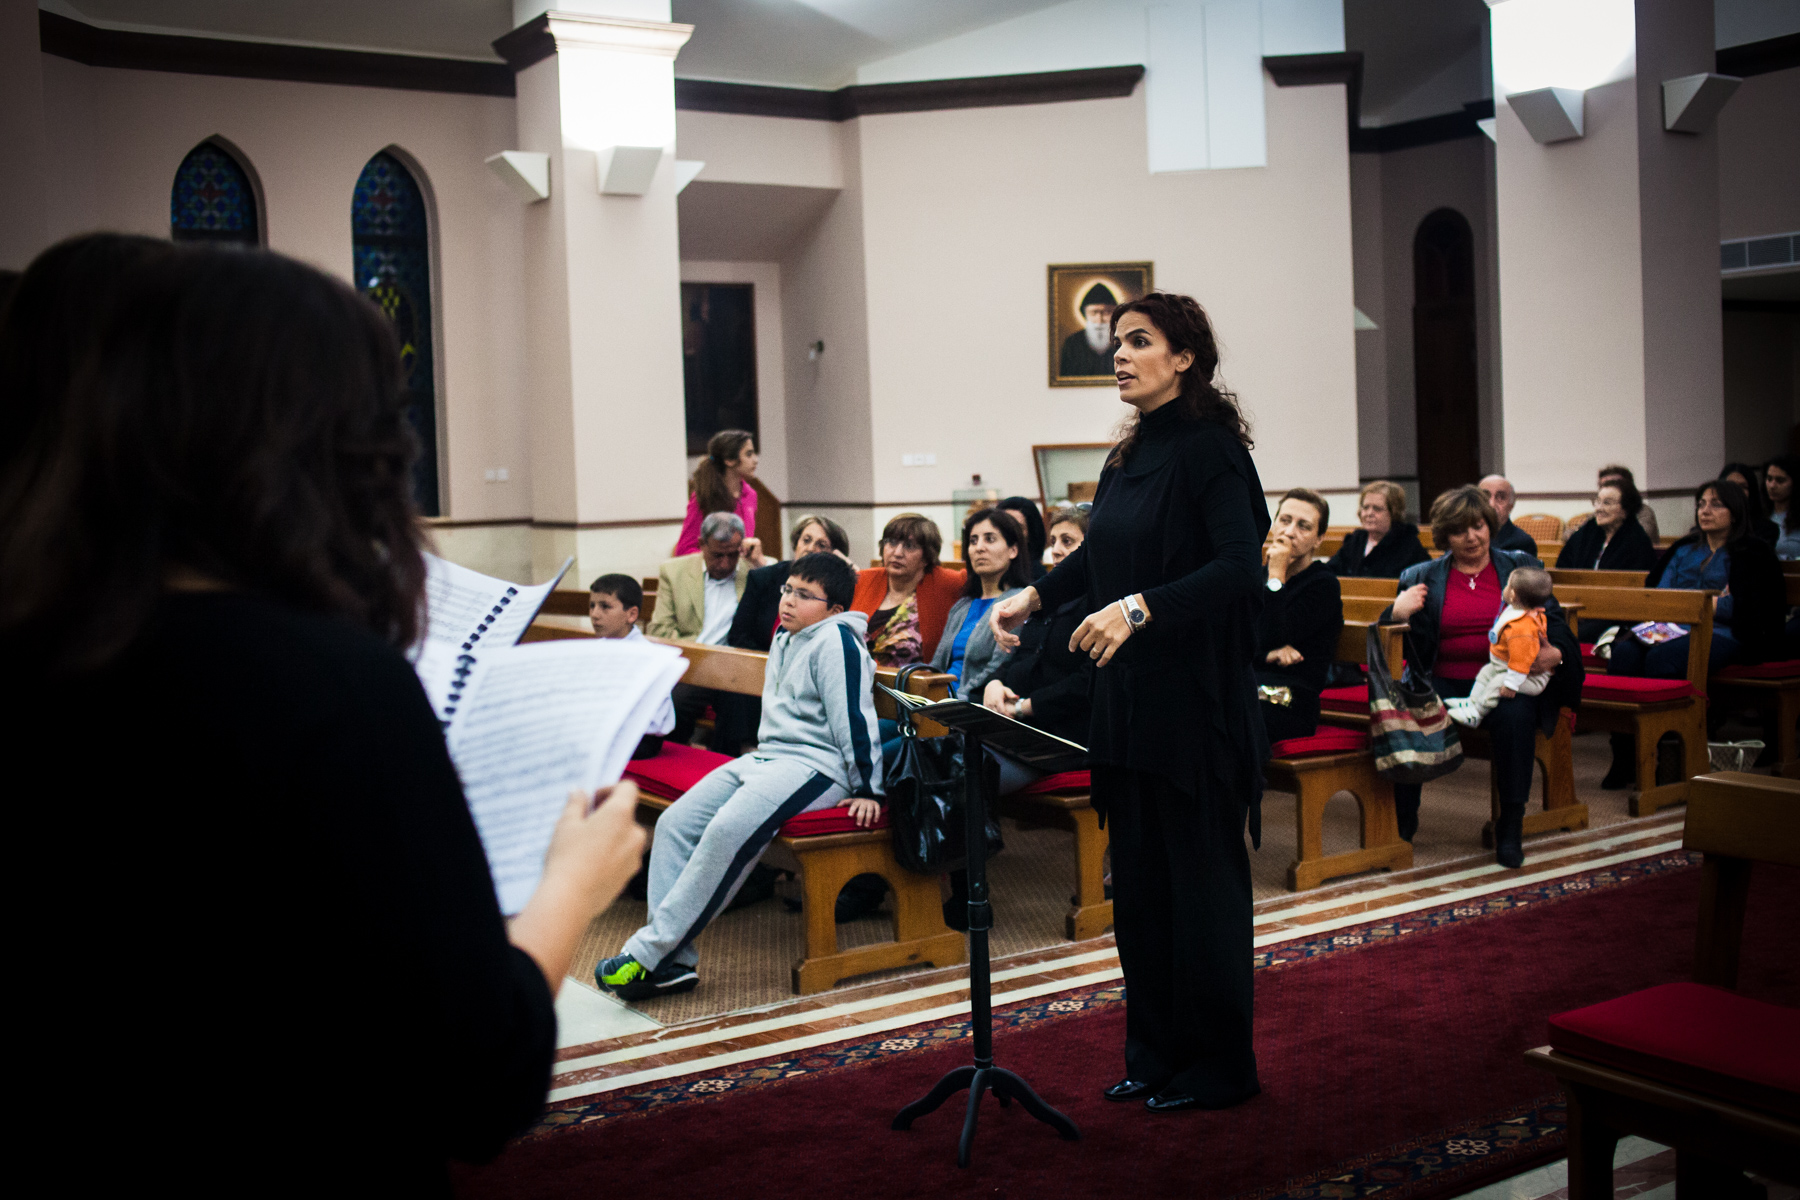 The Dozan wa Awtar choir perform at the St. Charbel Maronite Church in Amman, Jordan on April 19, 2011.